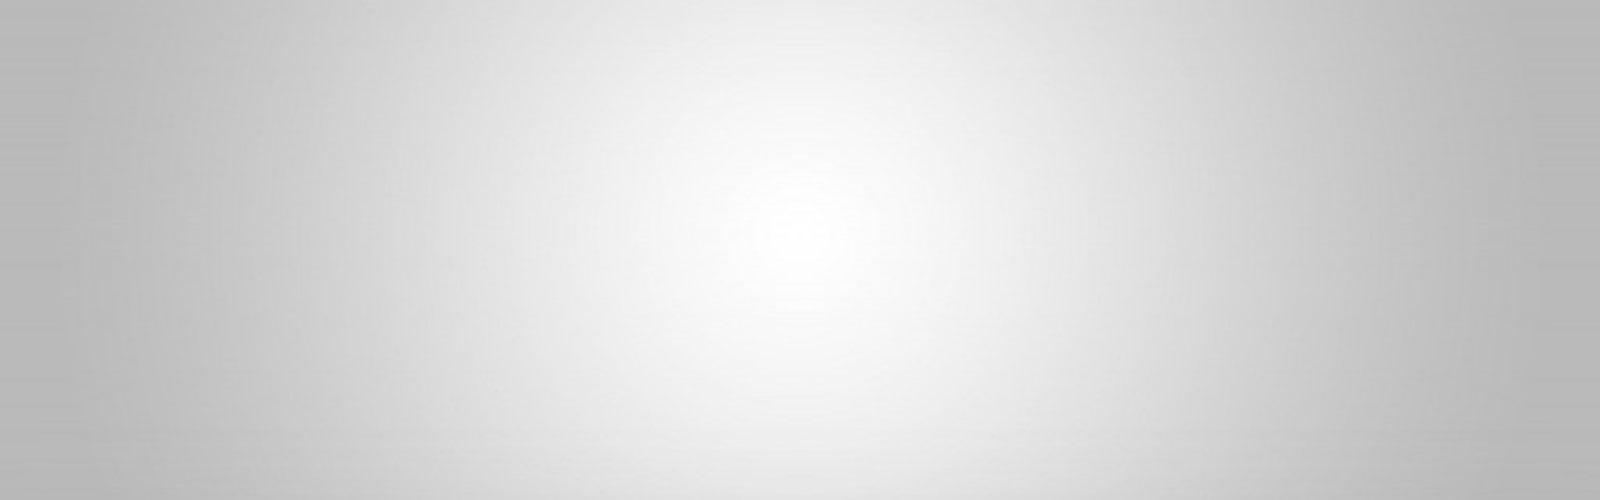 Grey-Background.jpg